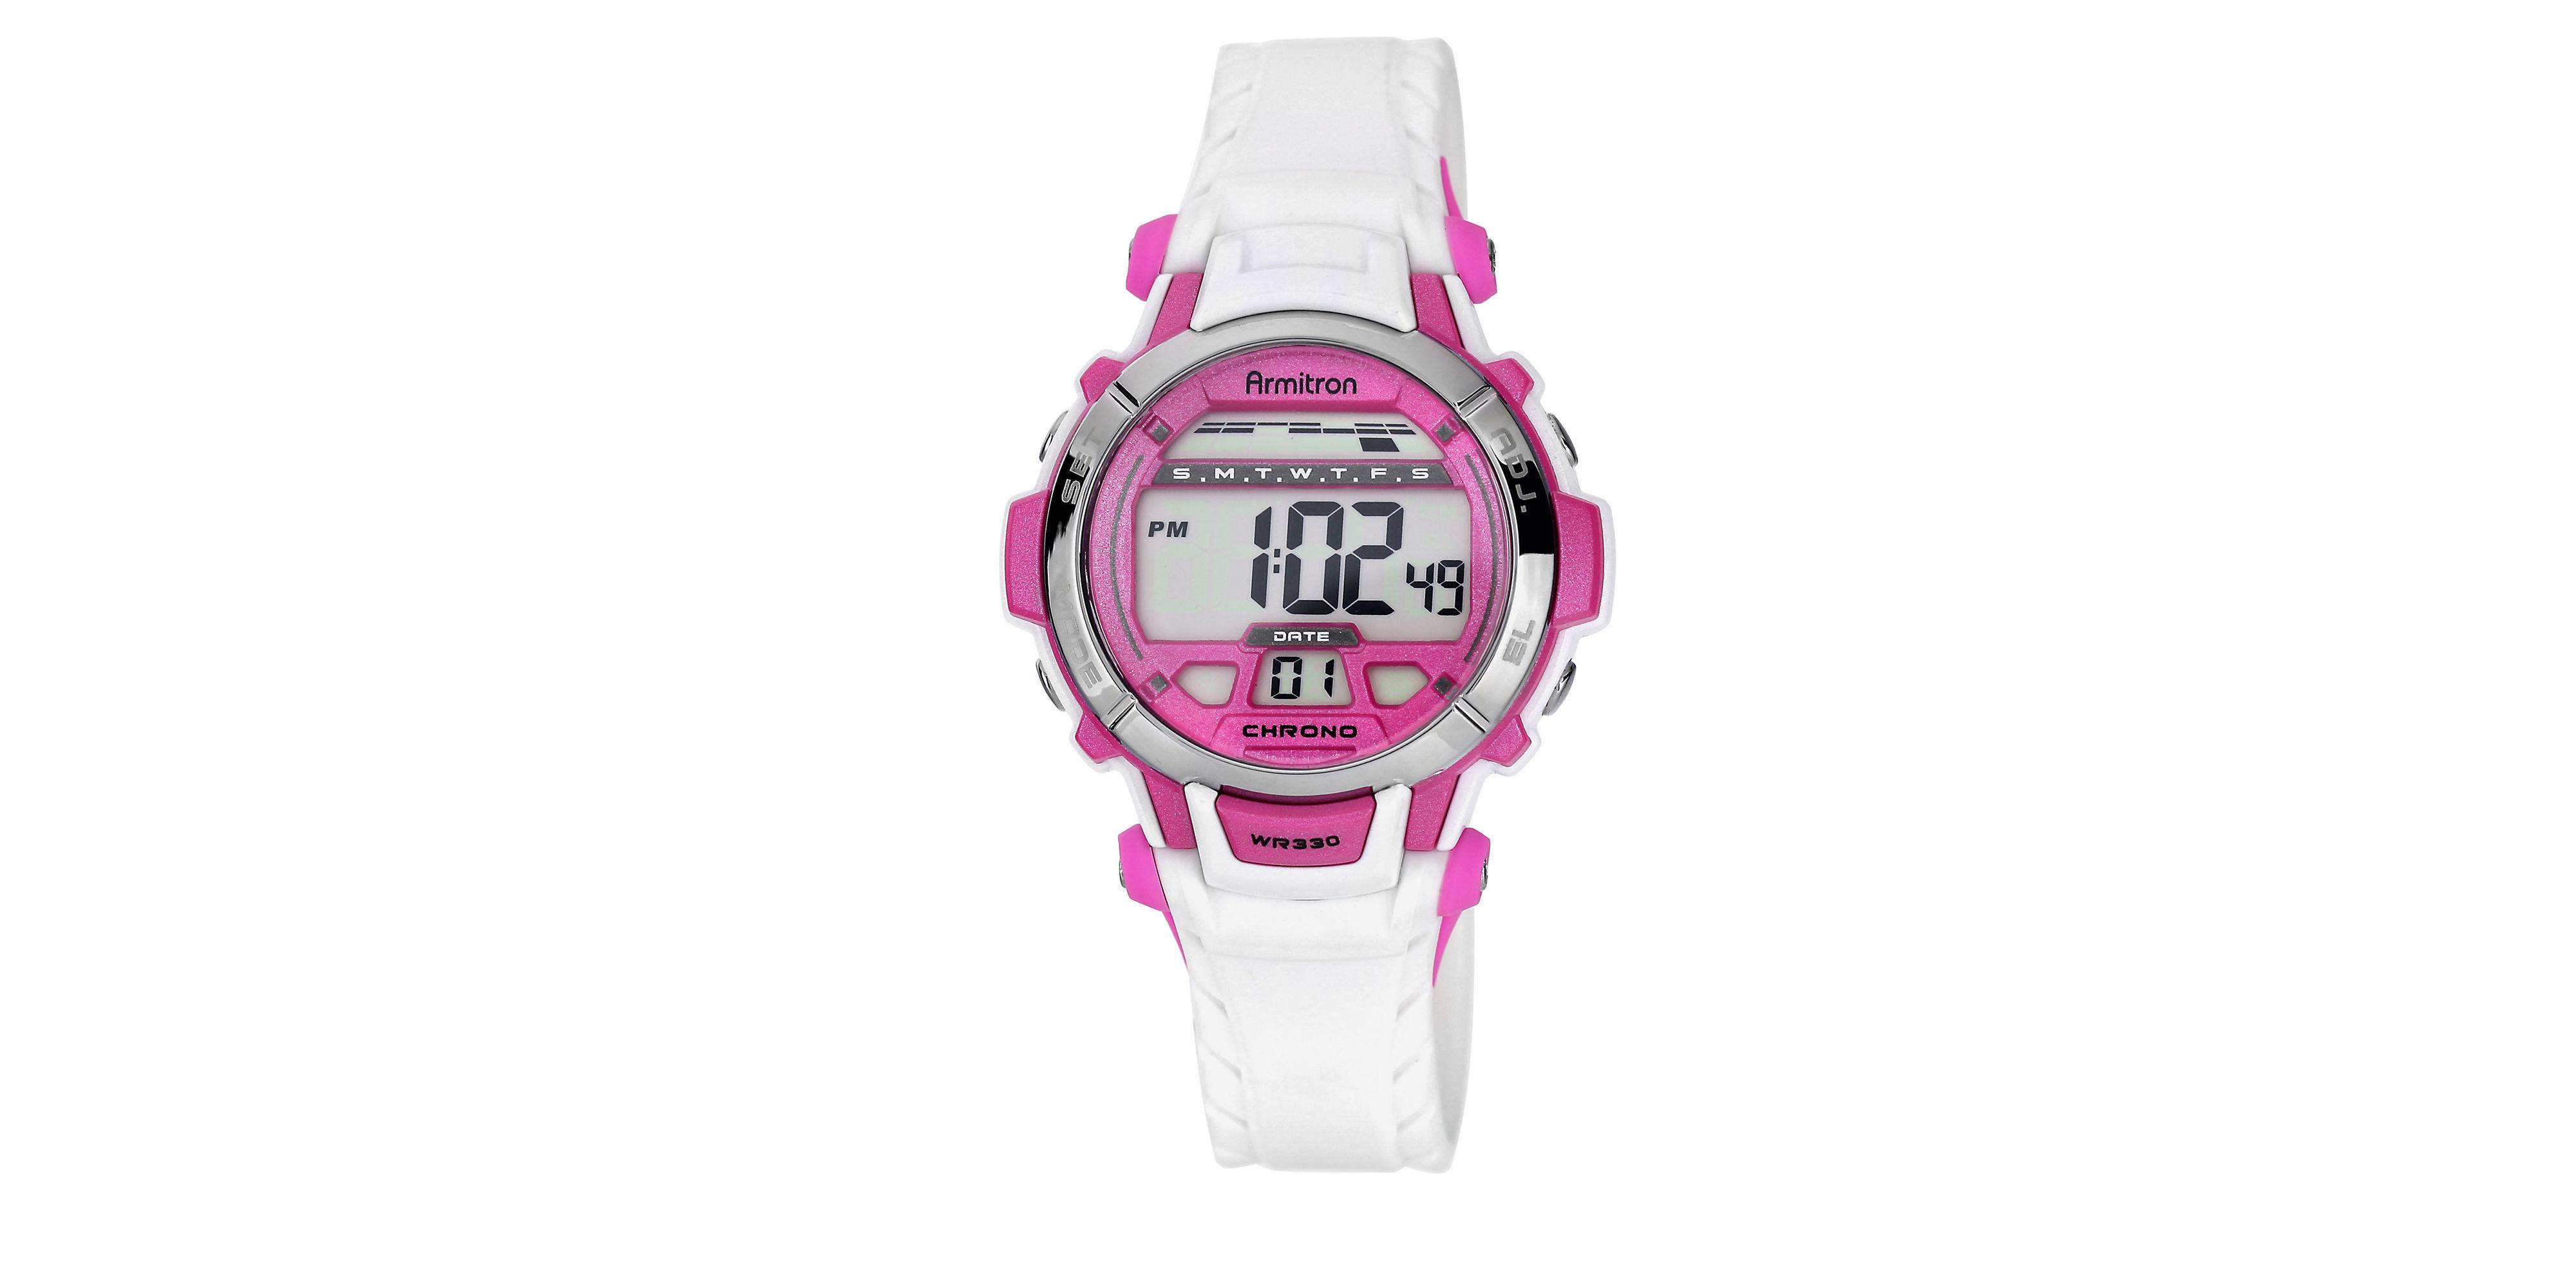 armitron all sport digital chronograph in pink